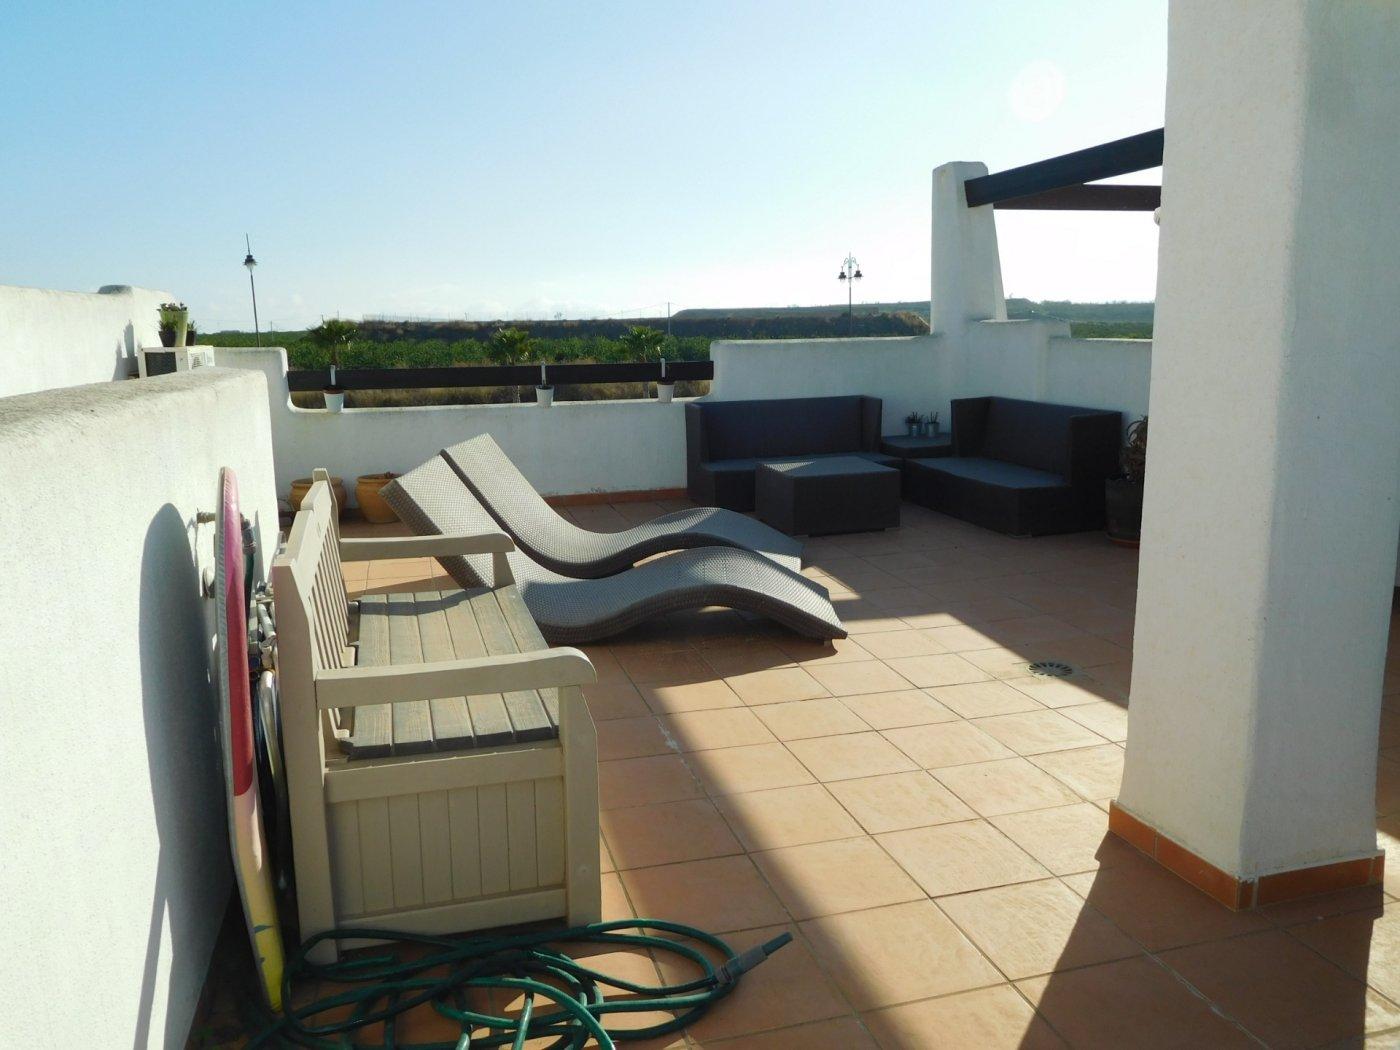 Gallery Image 16 of Apartment For rent in Condado De Alhama, Alhama De Murcia With Pool